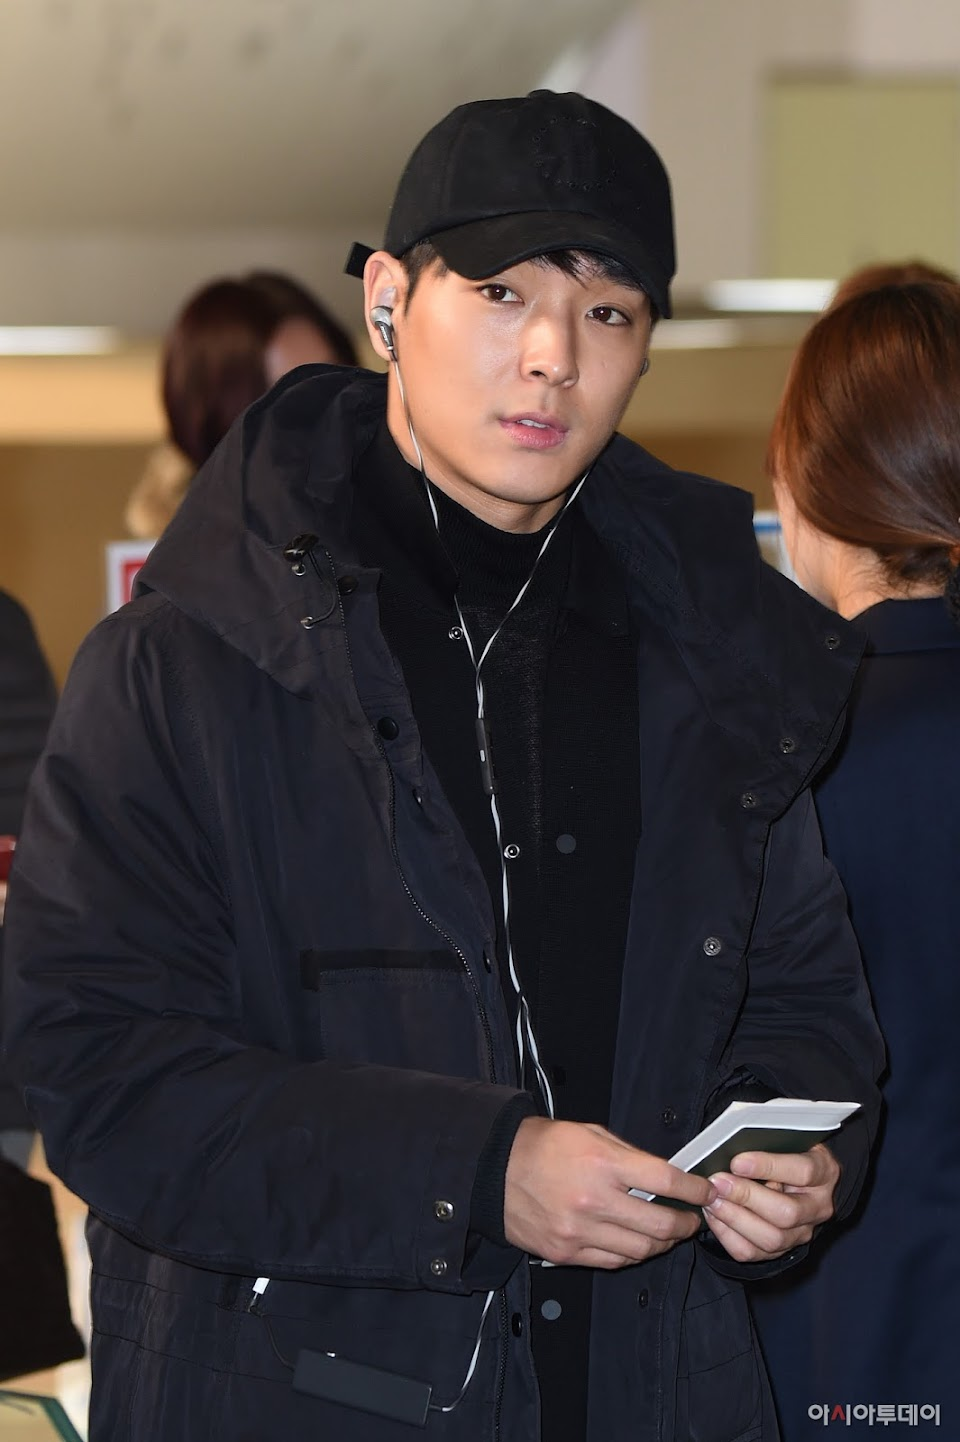 seungri jung joon young jonghoon 6